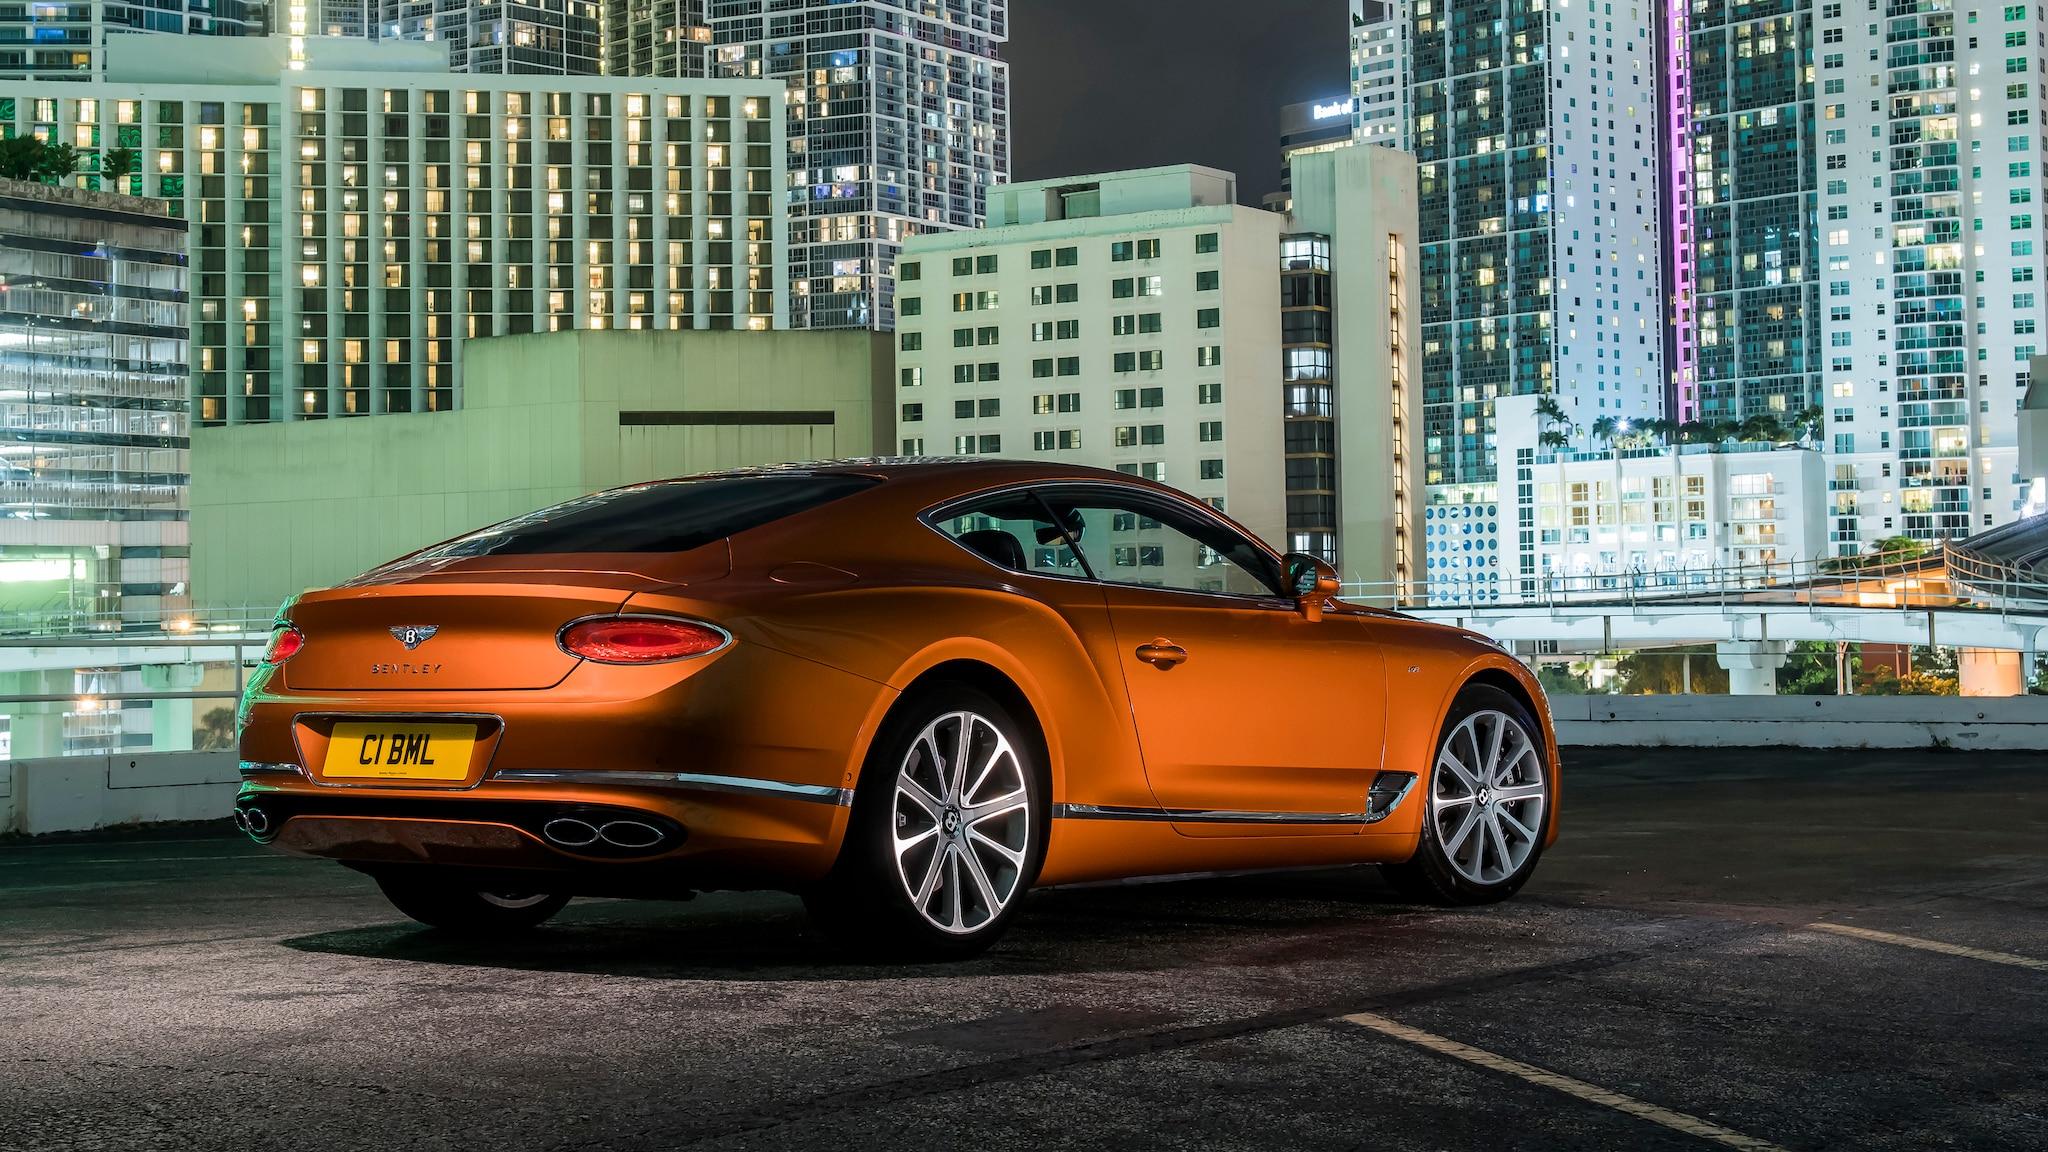 Bentley Continental GT V8 18